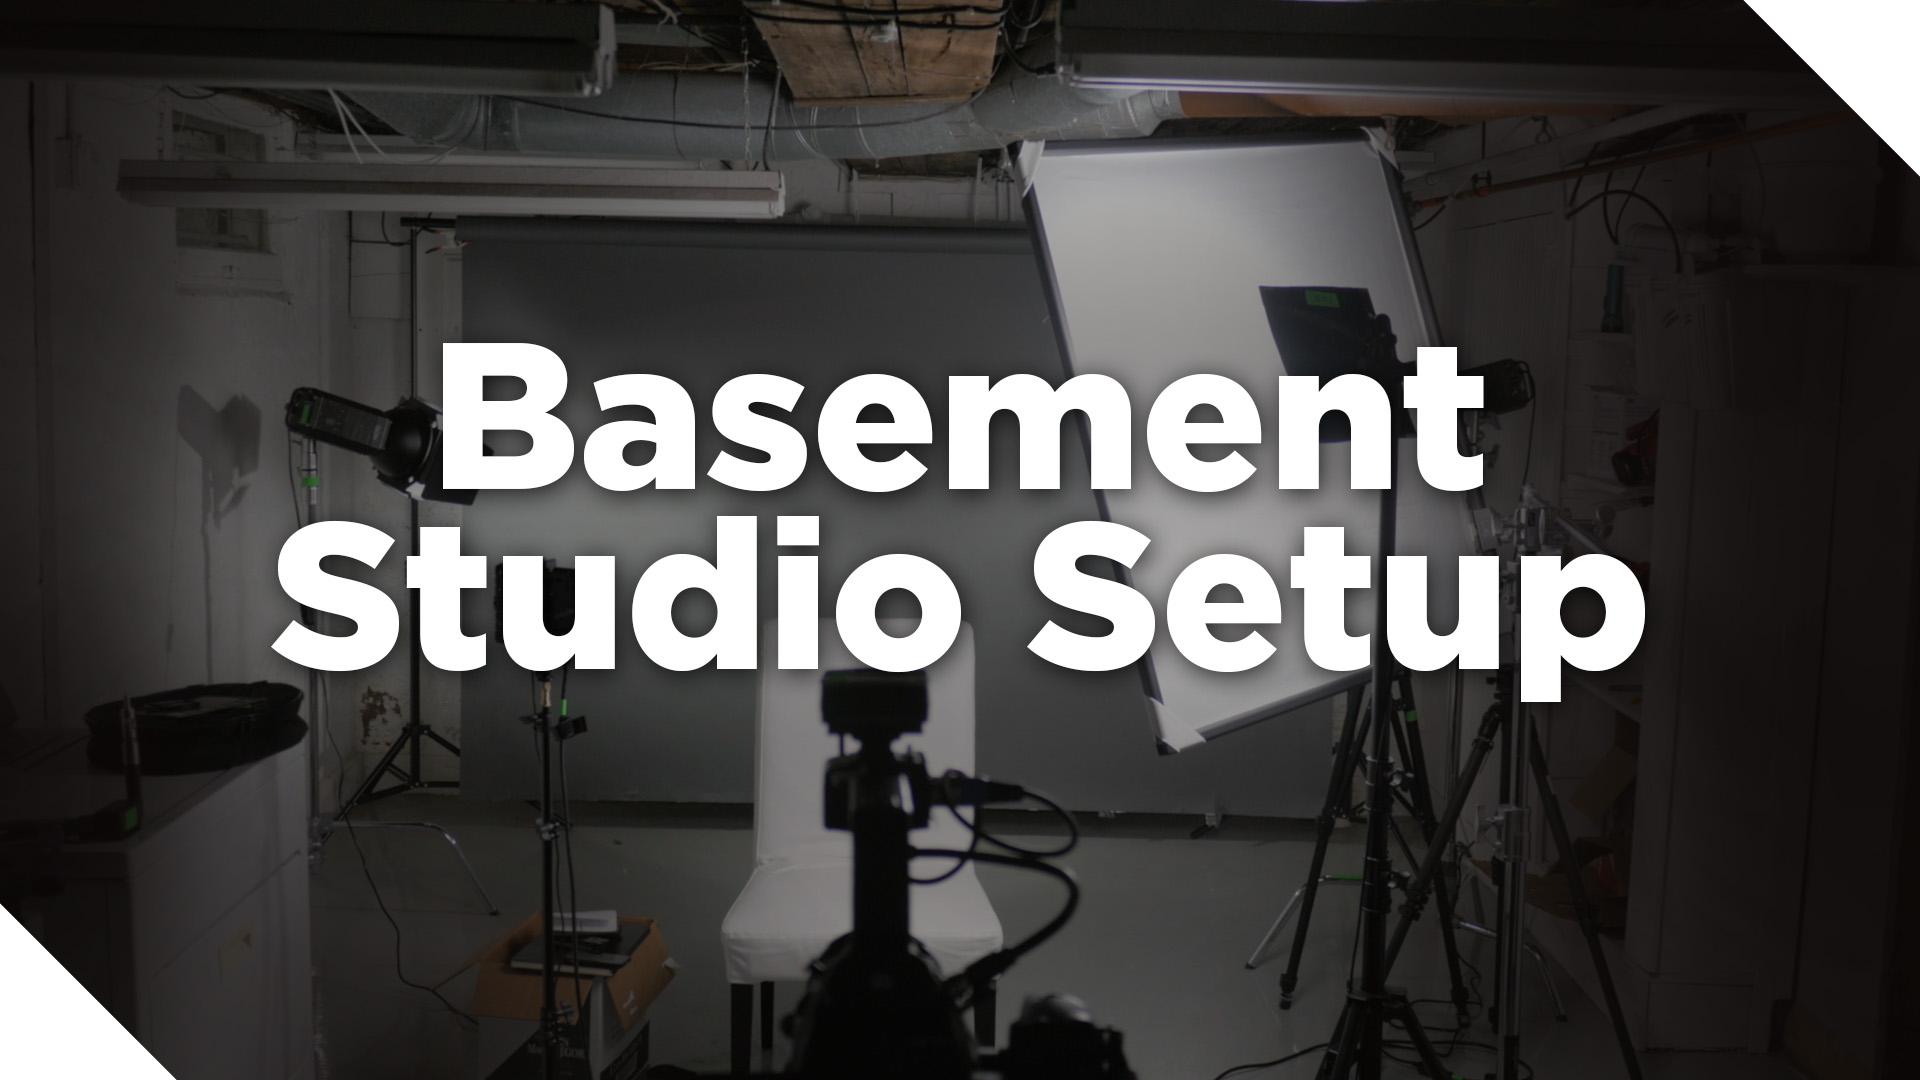 & The Studio Part 5: Setting Up a Basement Video Studio